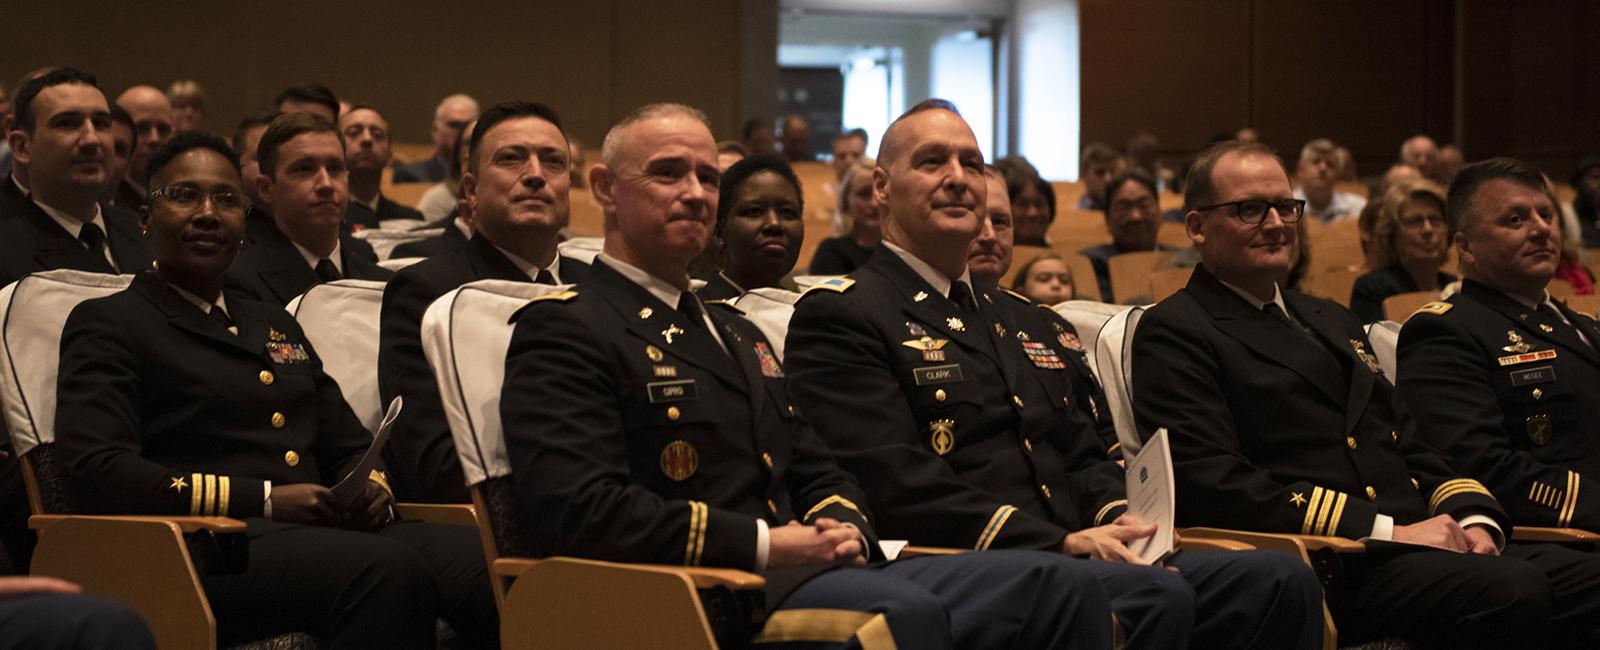 U.S. Naval War College students at their graduation.